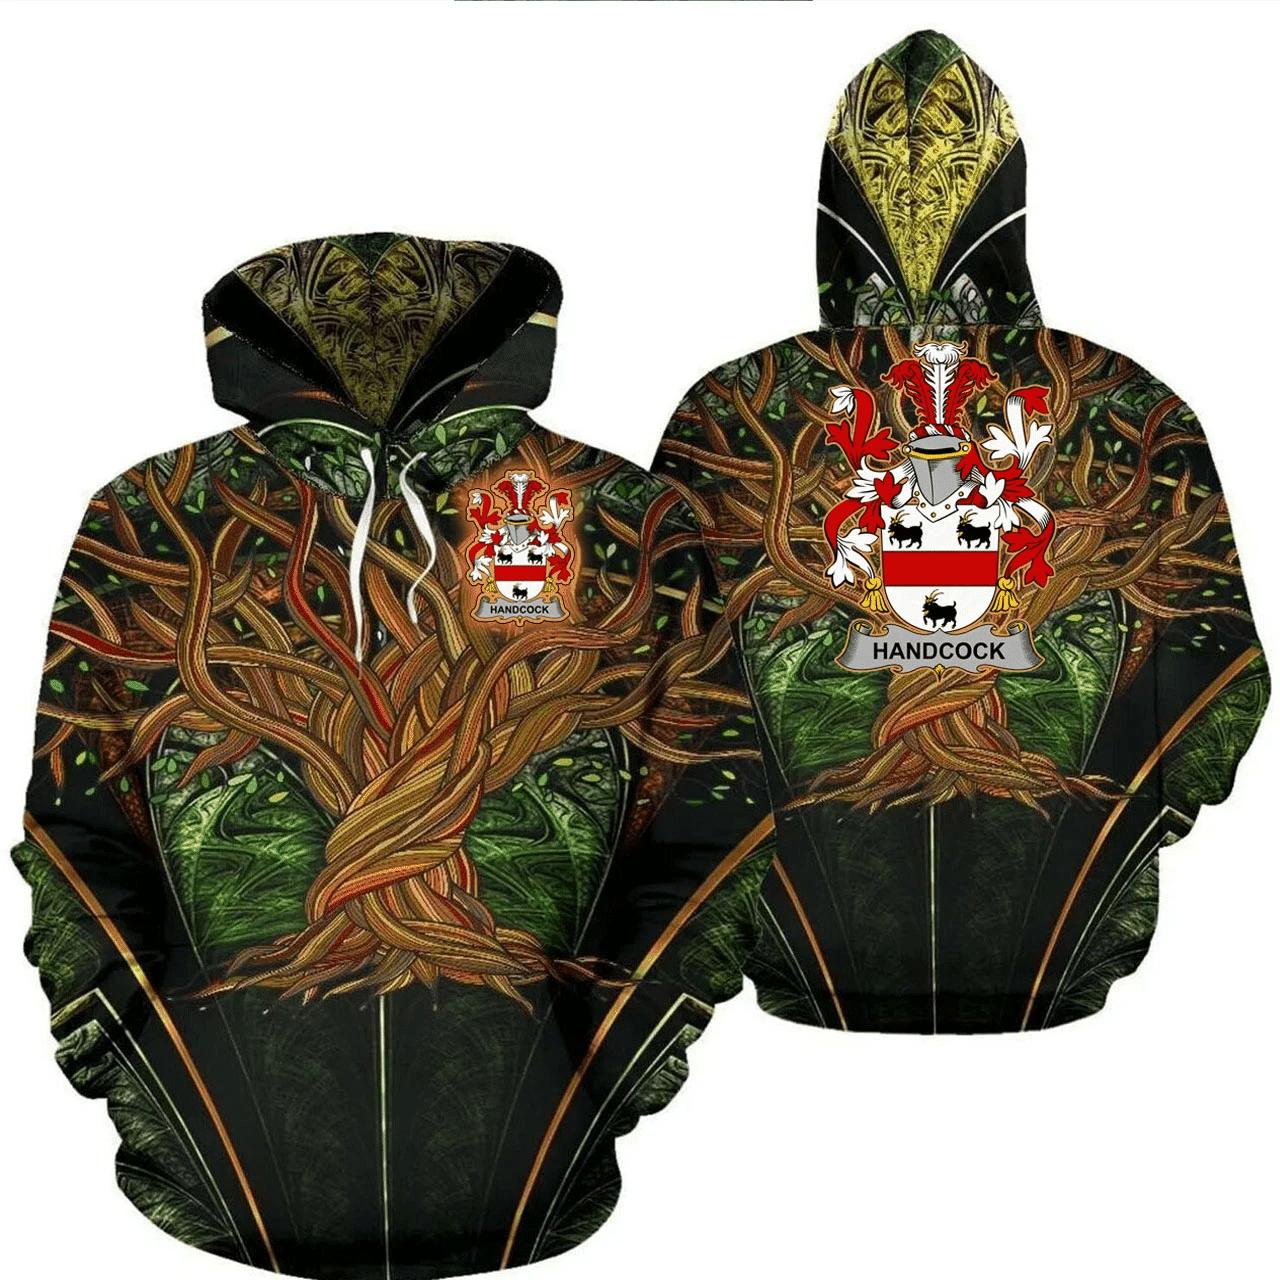 1stIreland Ireland Hoodie - Handcock Irish Family Crest Hoodie - Tree Of Life A7